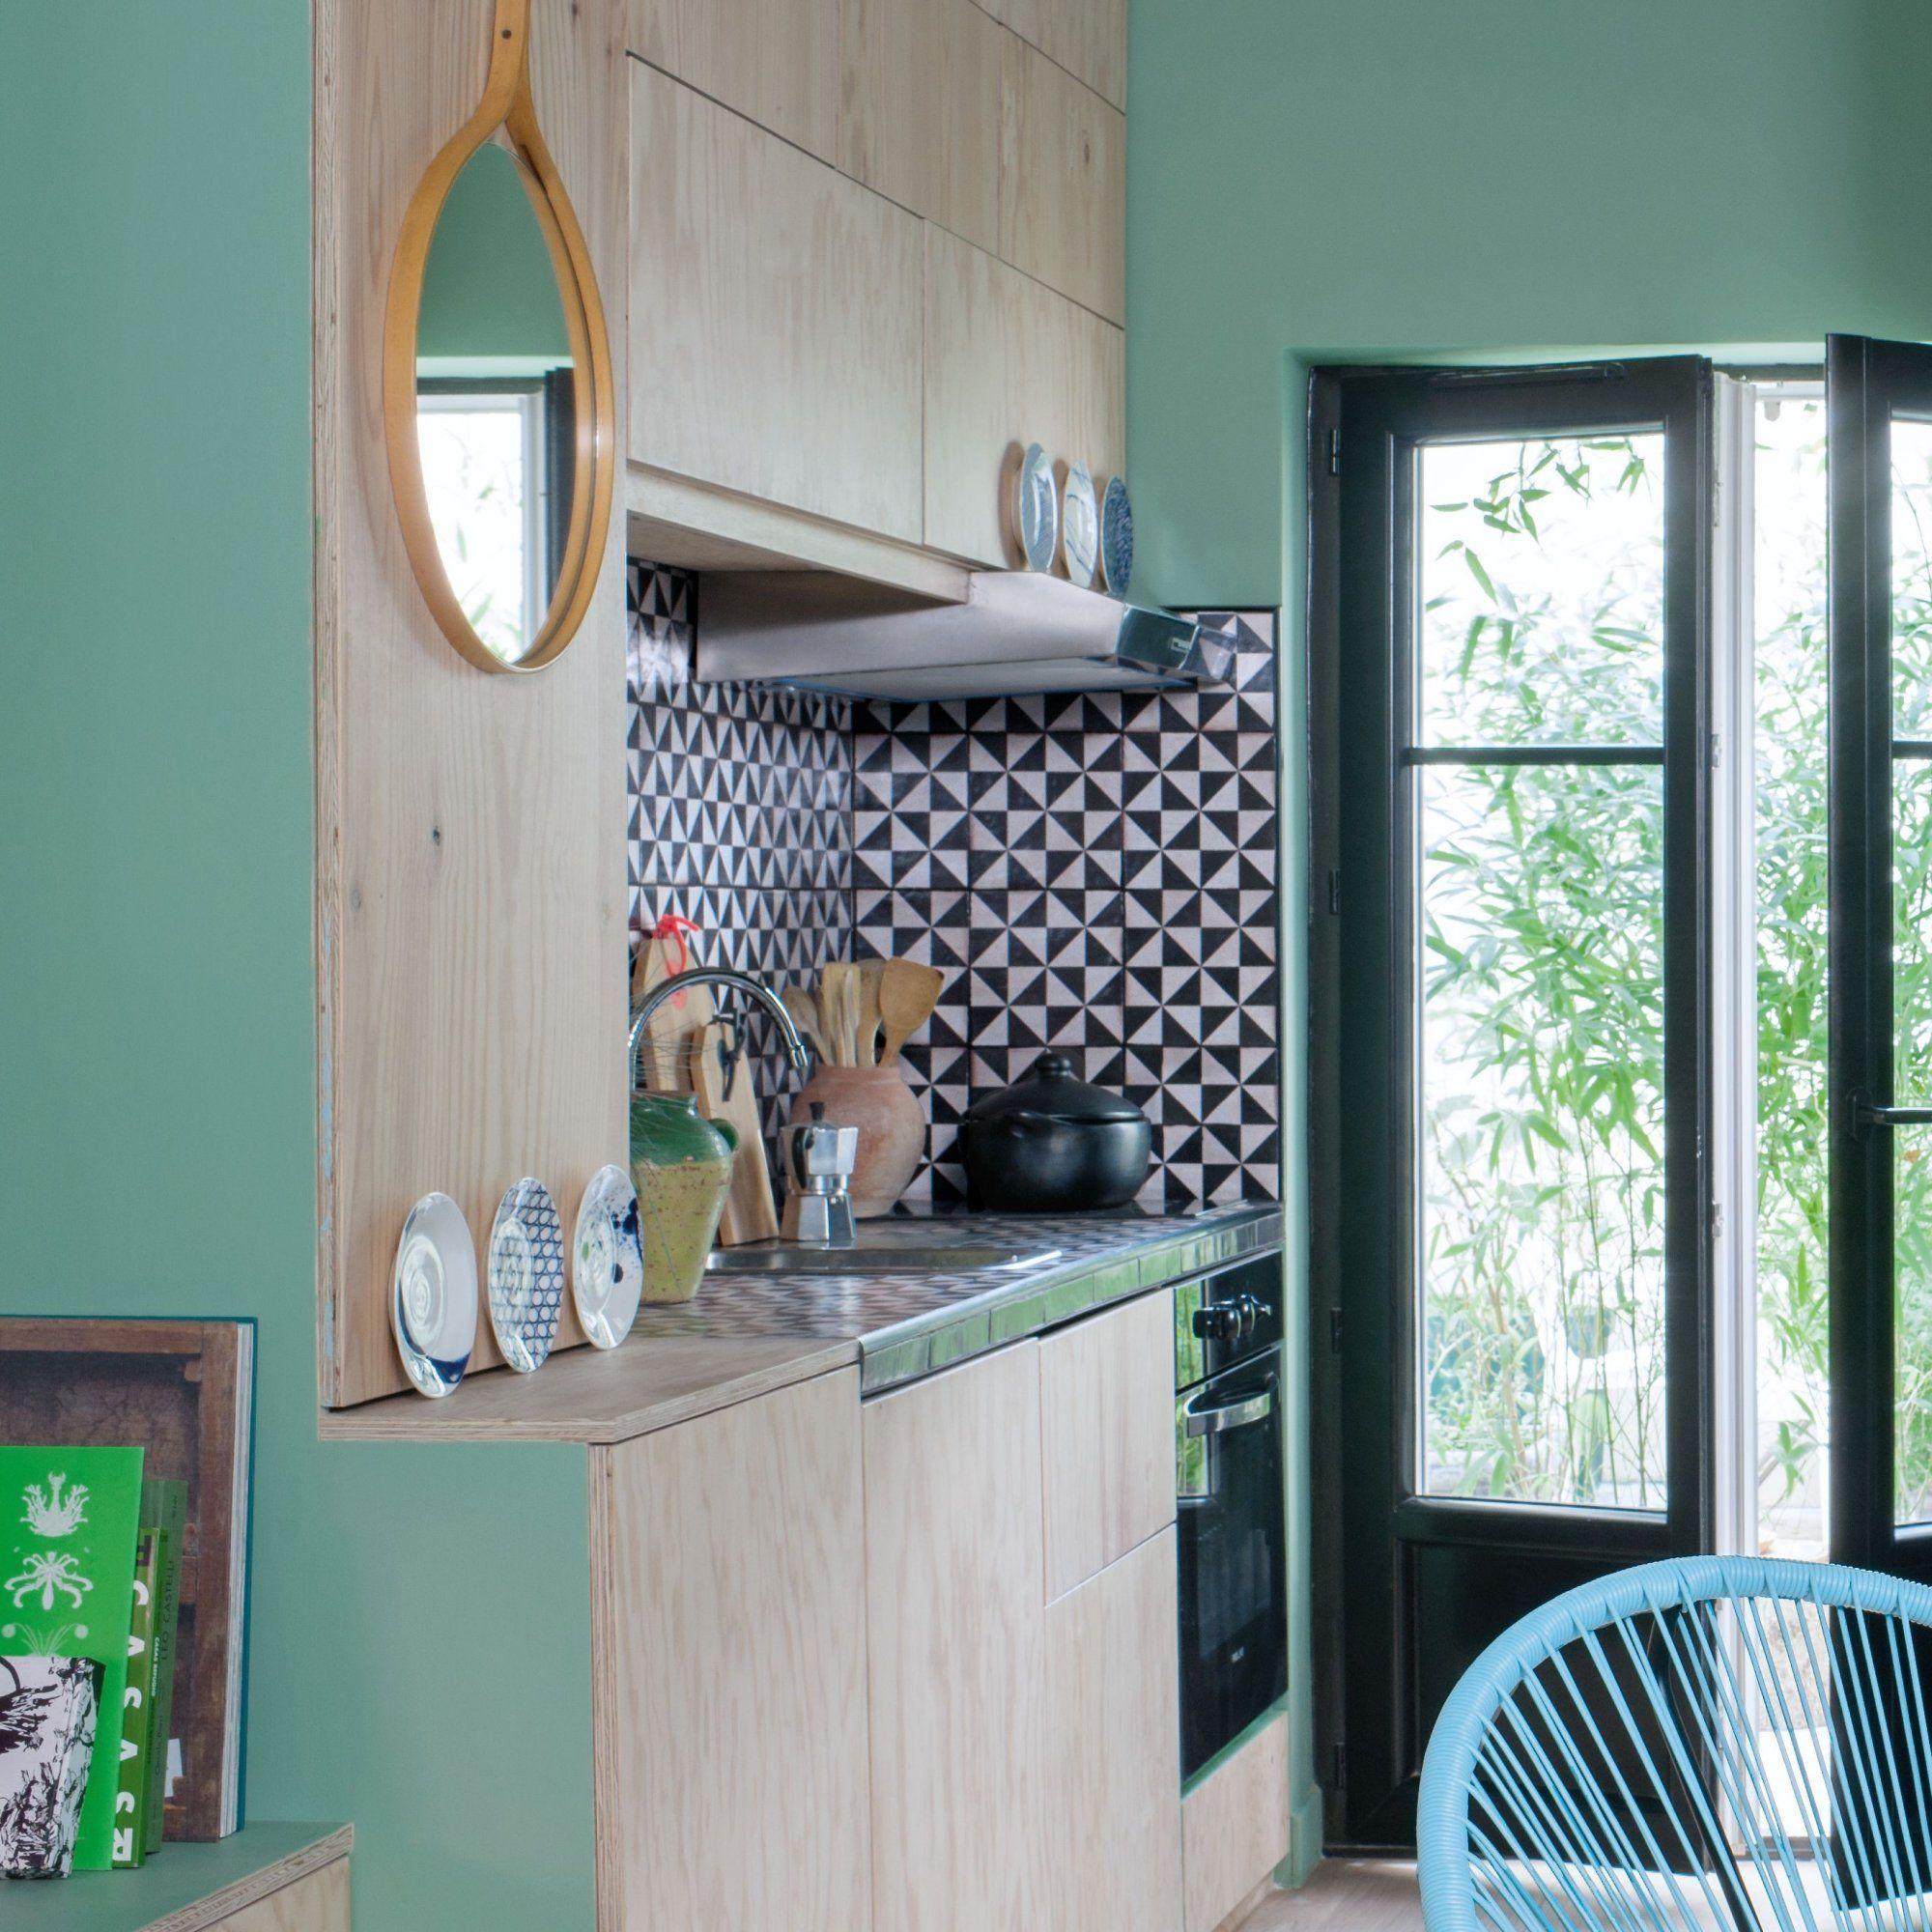 Best Kitchen Splashback Ideas & Cool Tile Decoration That